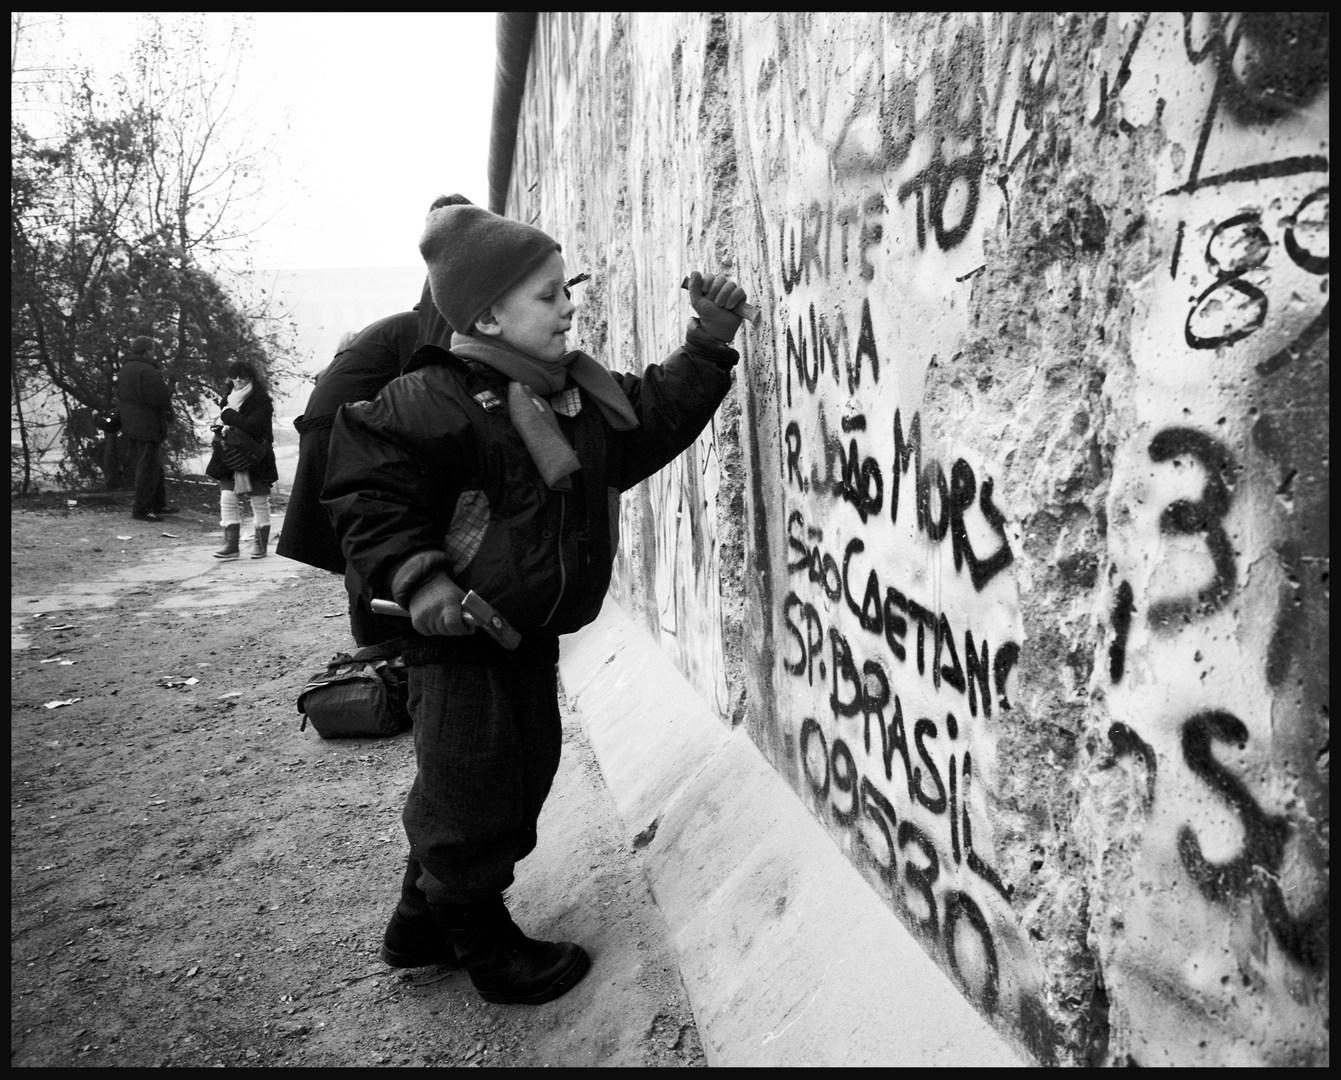 Wallpecker, Berlin. November, 1989.